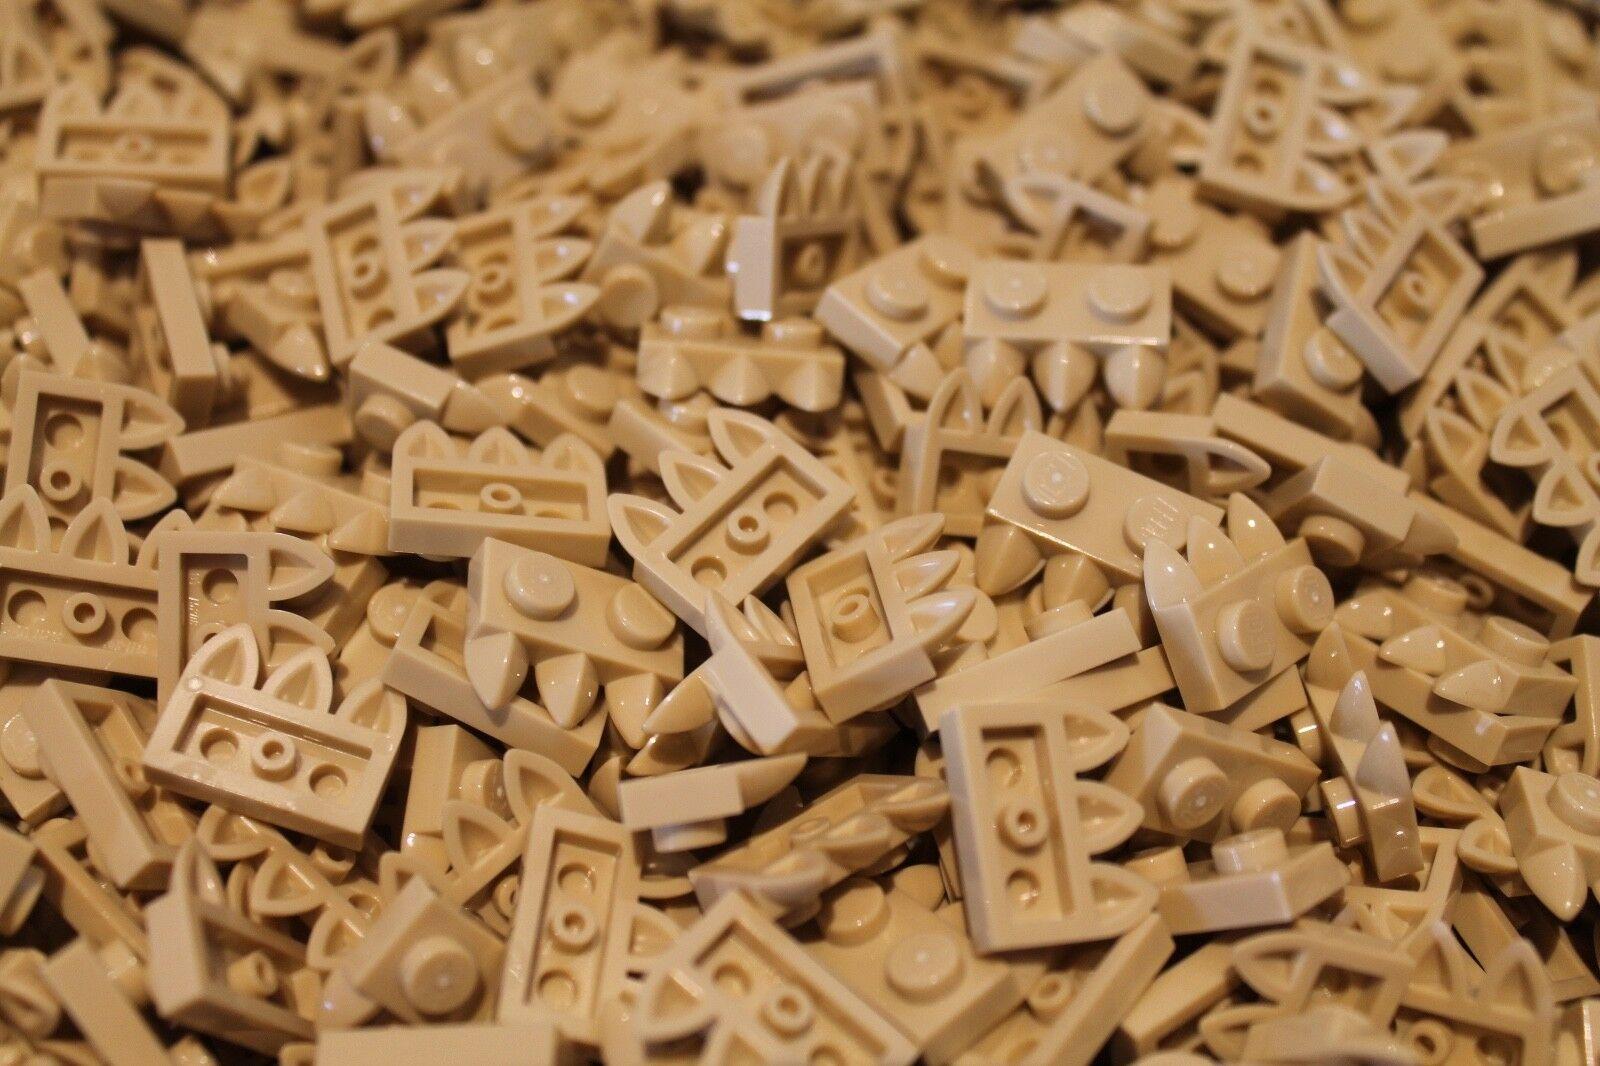 500 500 500 x LEGO® Plate   Platte 1x2 Zähne   Klauen (15208 ) in Sand   Beige   Tan NEU 95dd7e